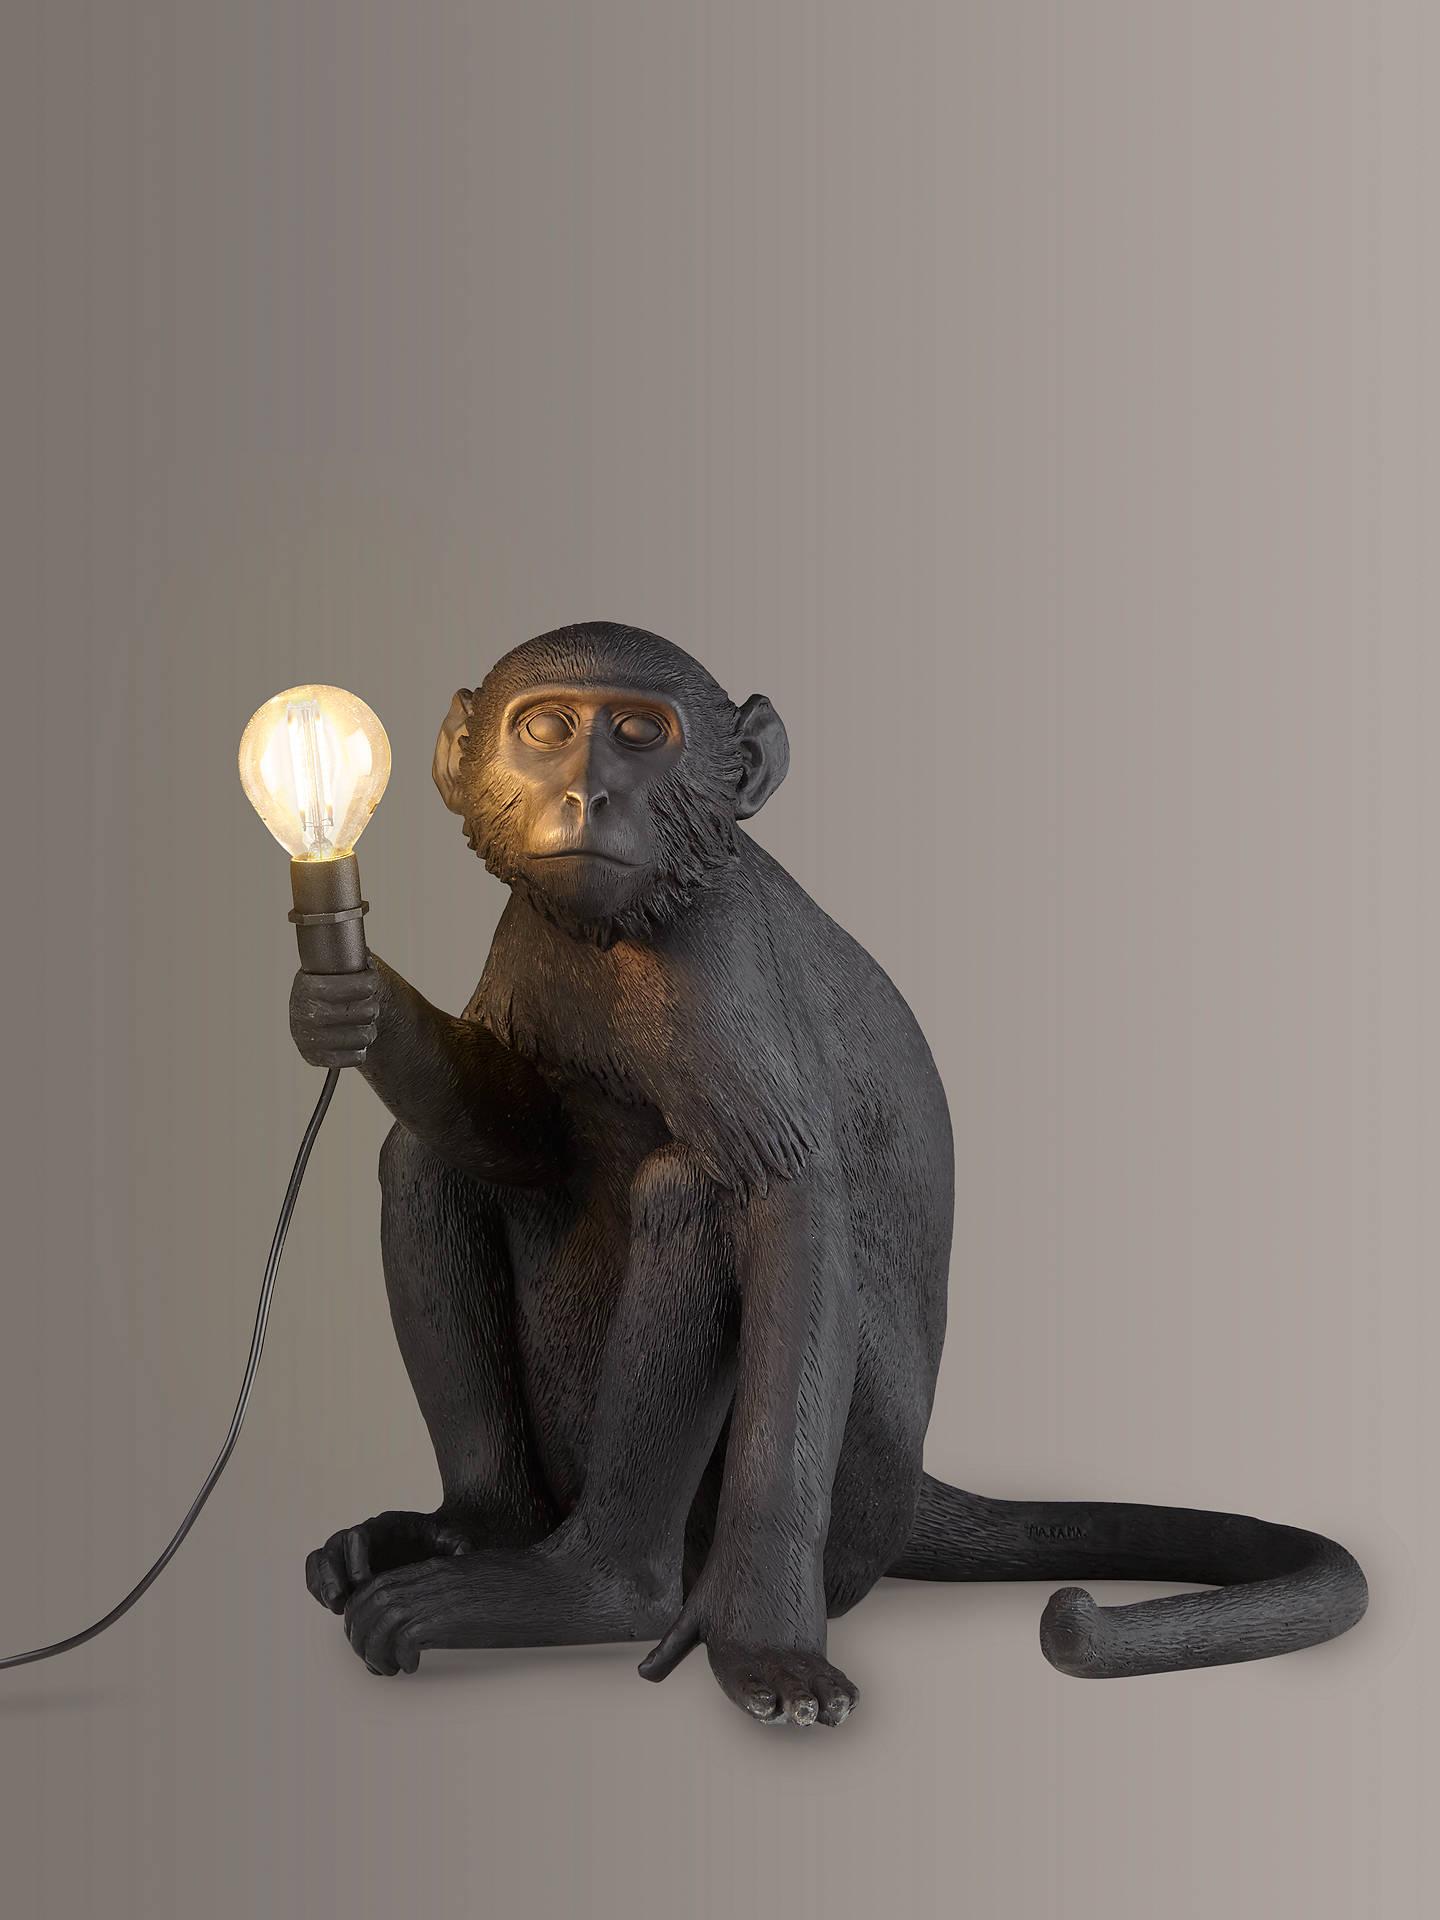 Table LampBlack Seletti Monkey Table Sitting Monkey Sitting Seletti qVpSzMU